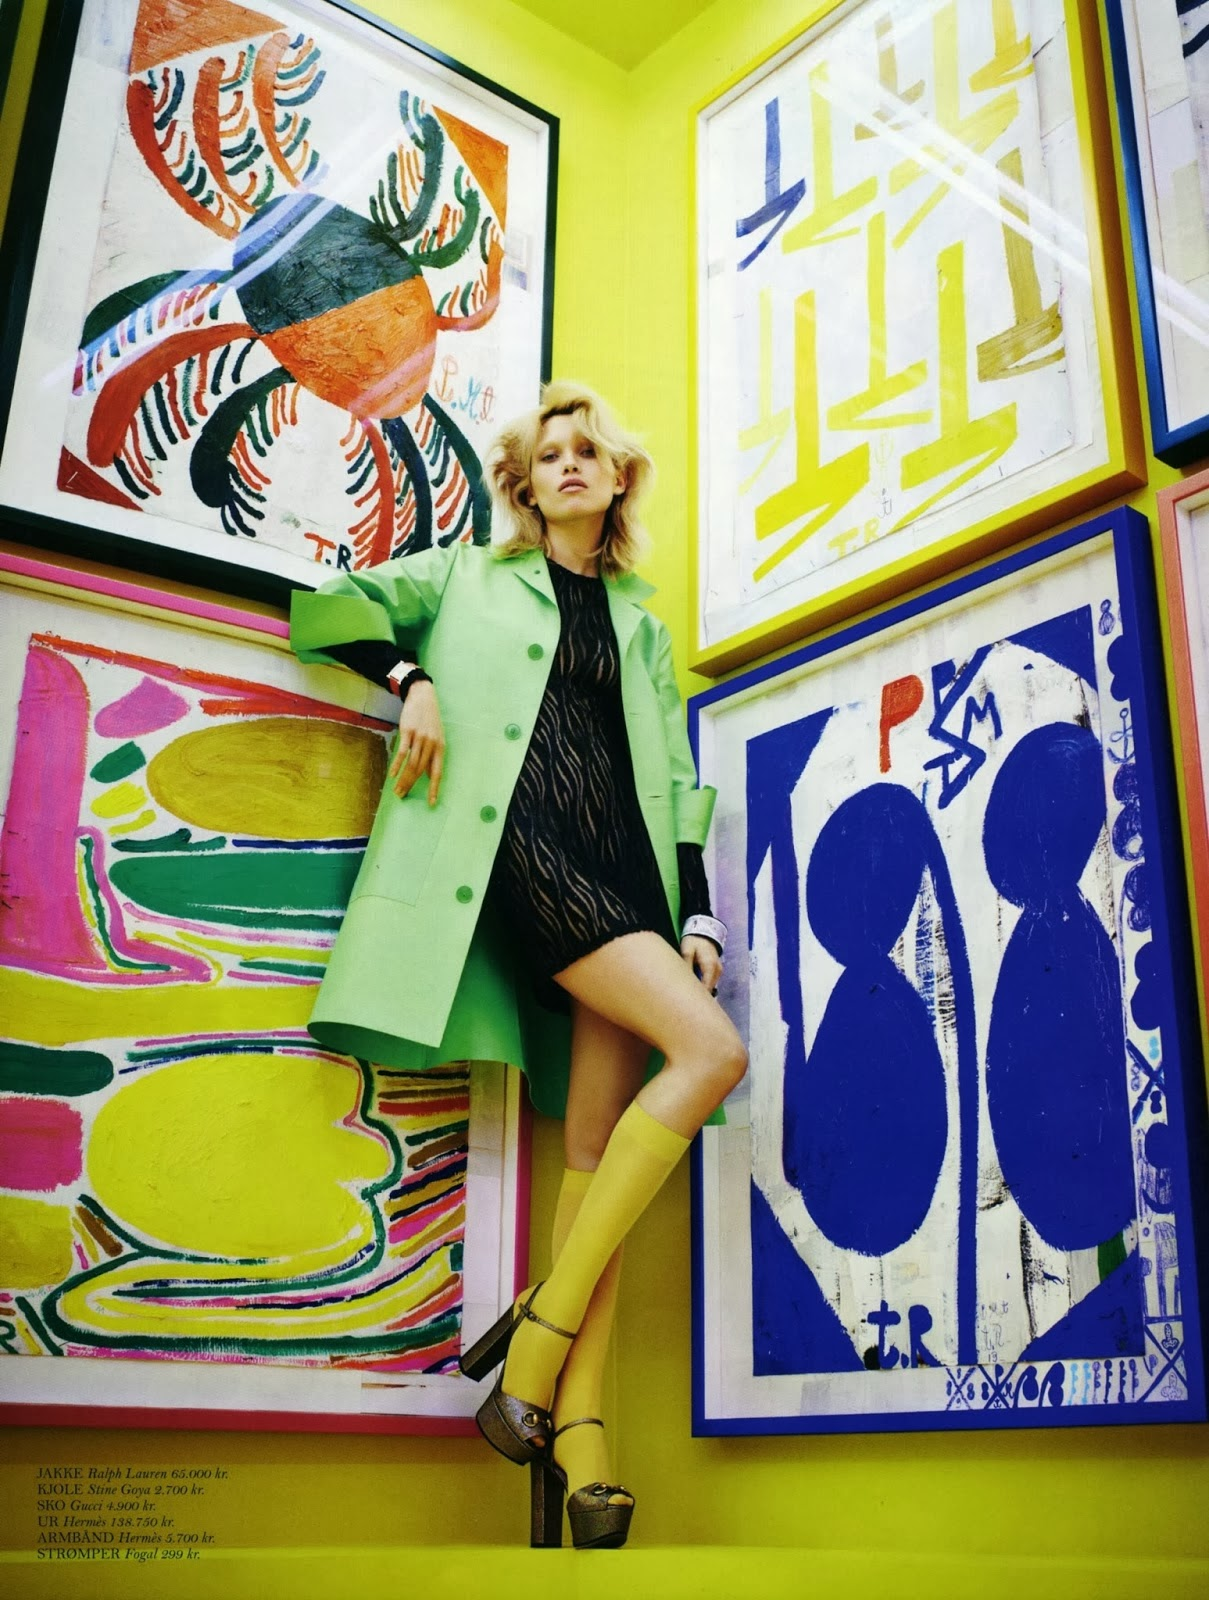 Hana Jirickova HQ Pictures Cover Magzine Photoshoot February 2014